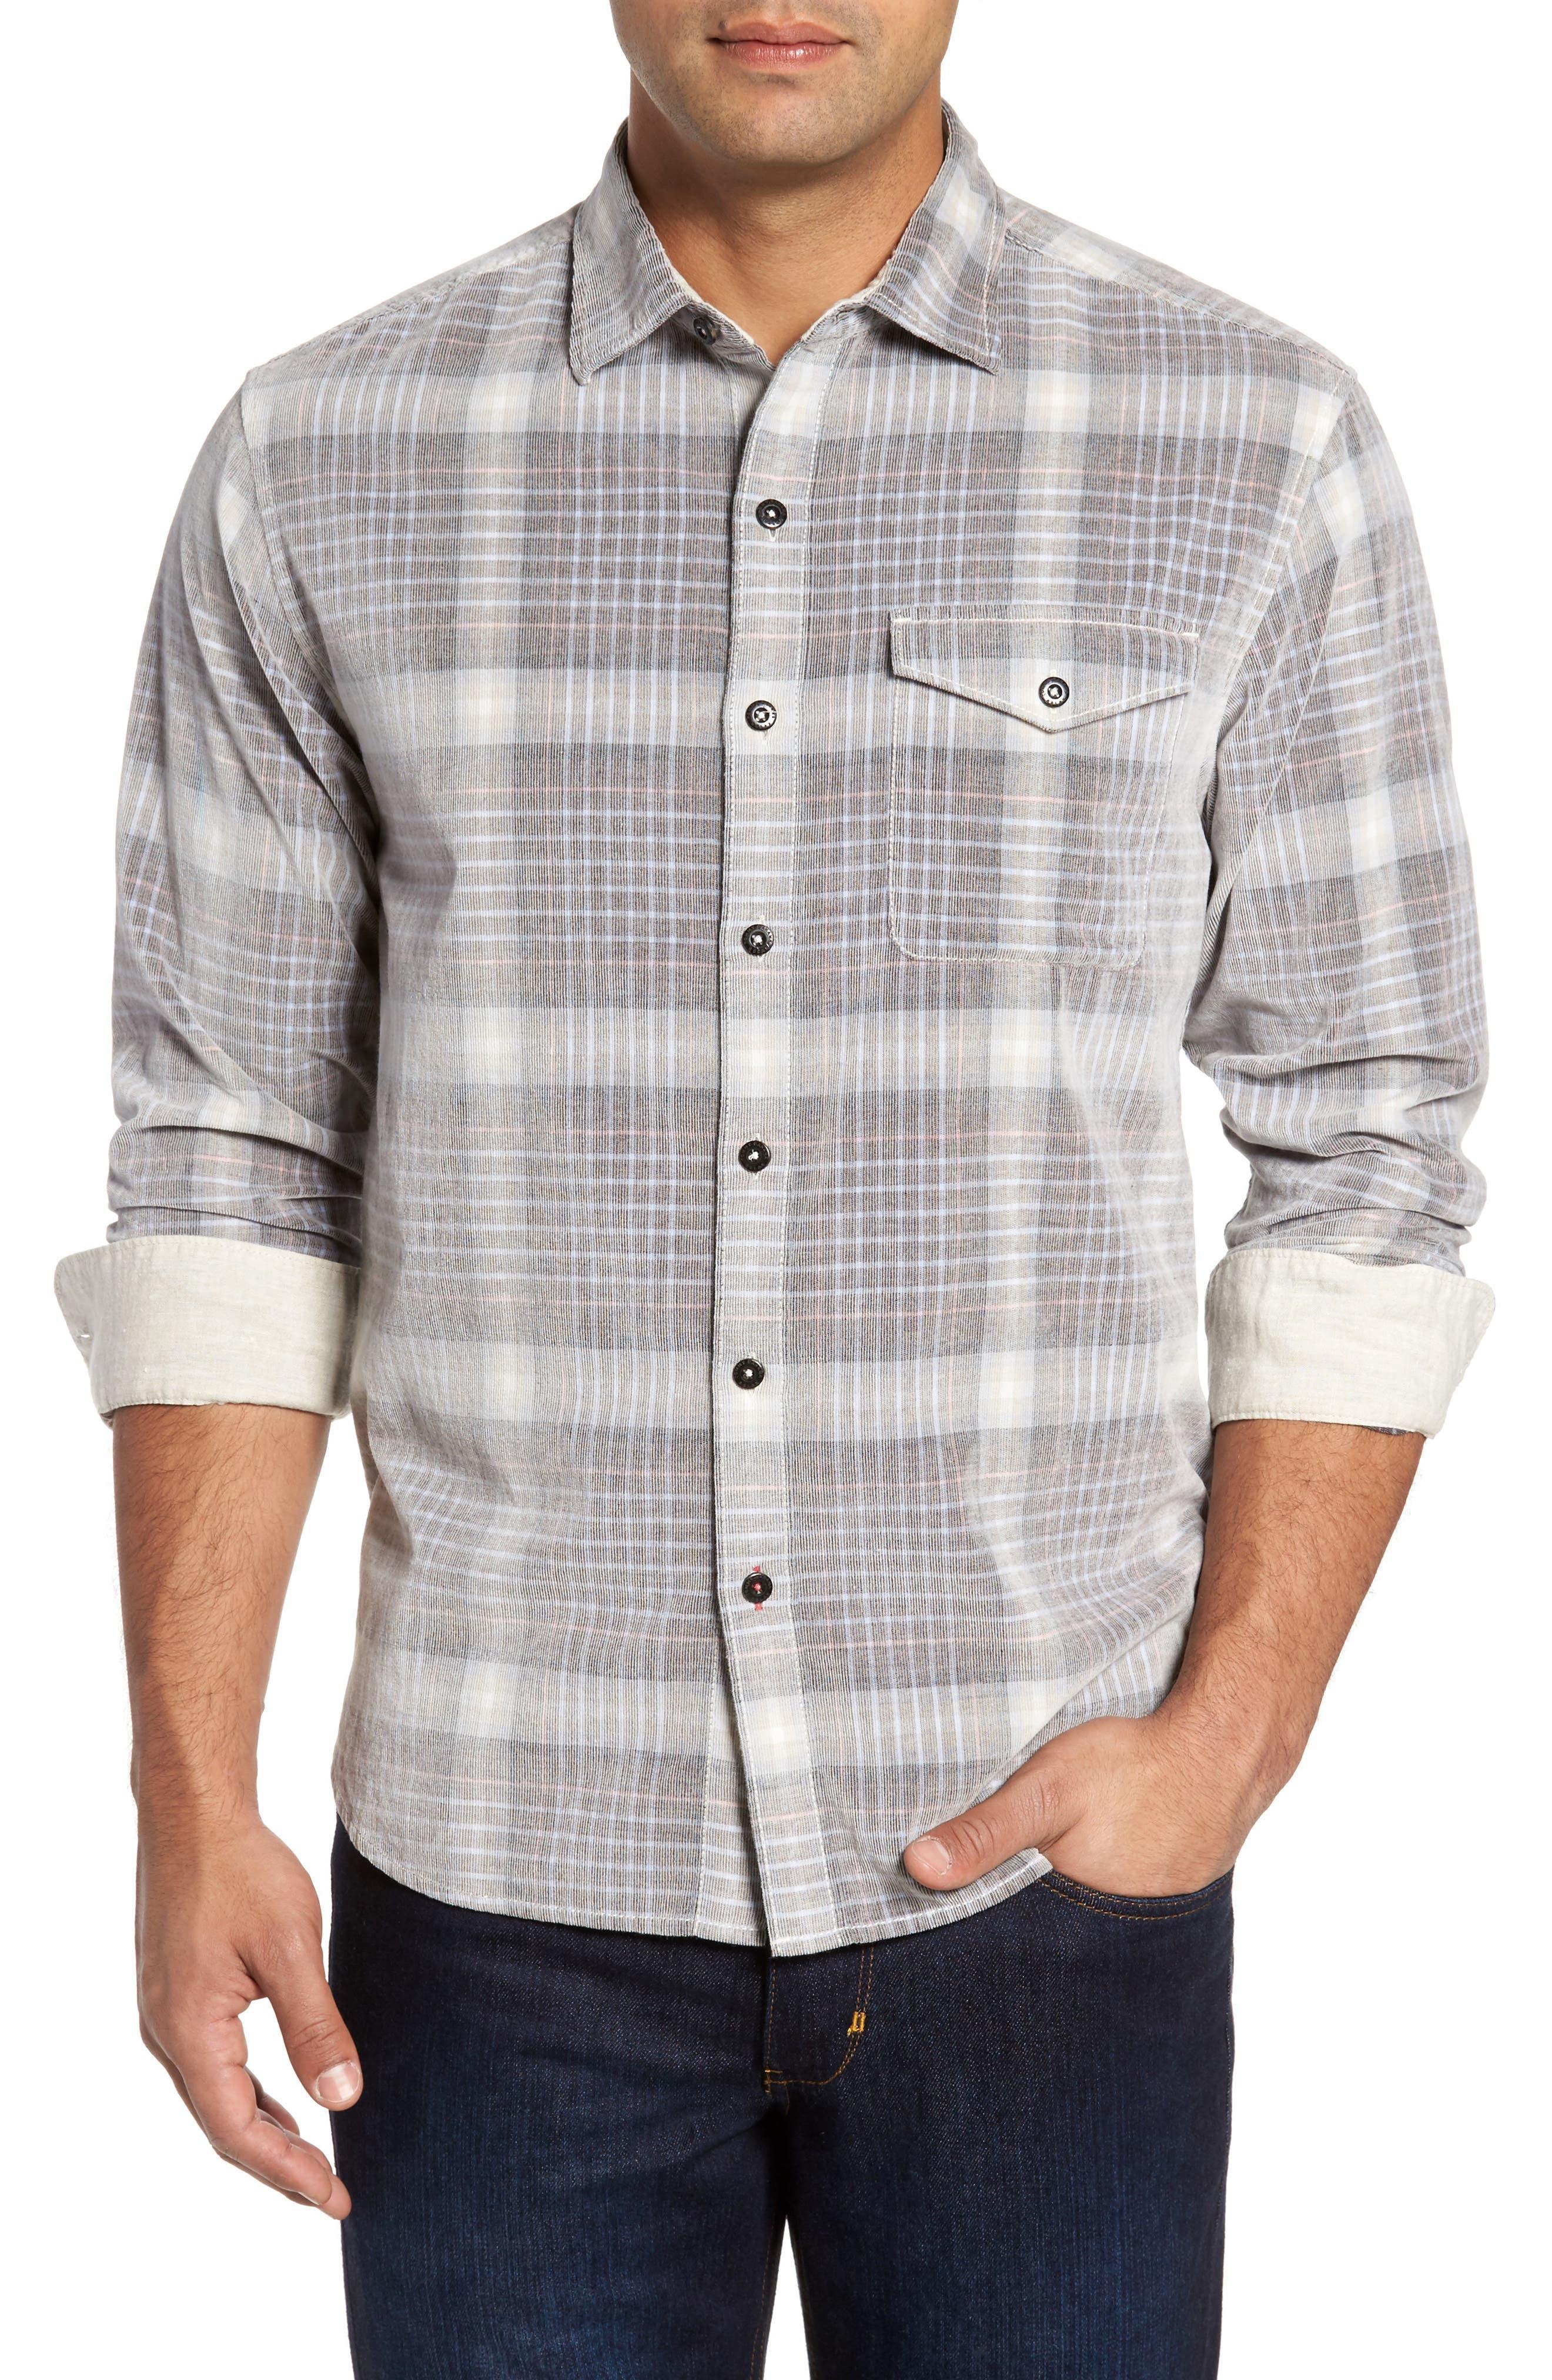 Alternate Image 1 Selected - Tommy Bahama Standard Fit Plaid Sport Shirt